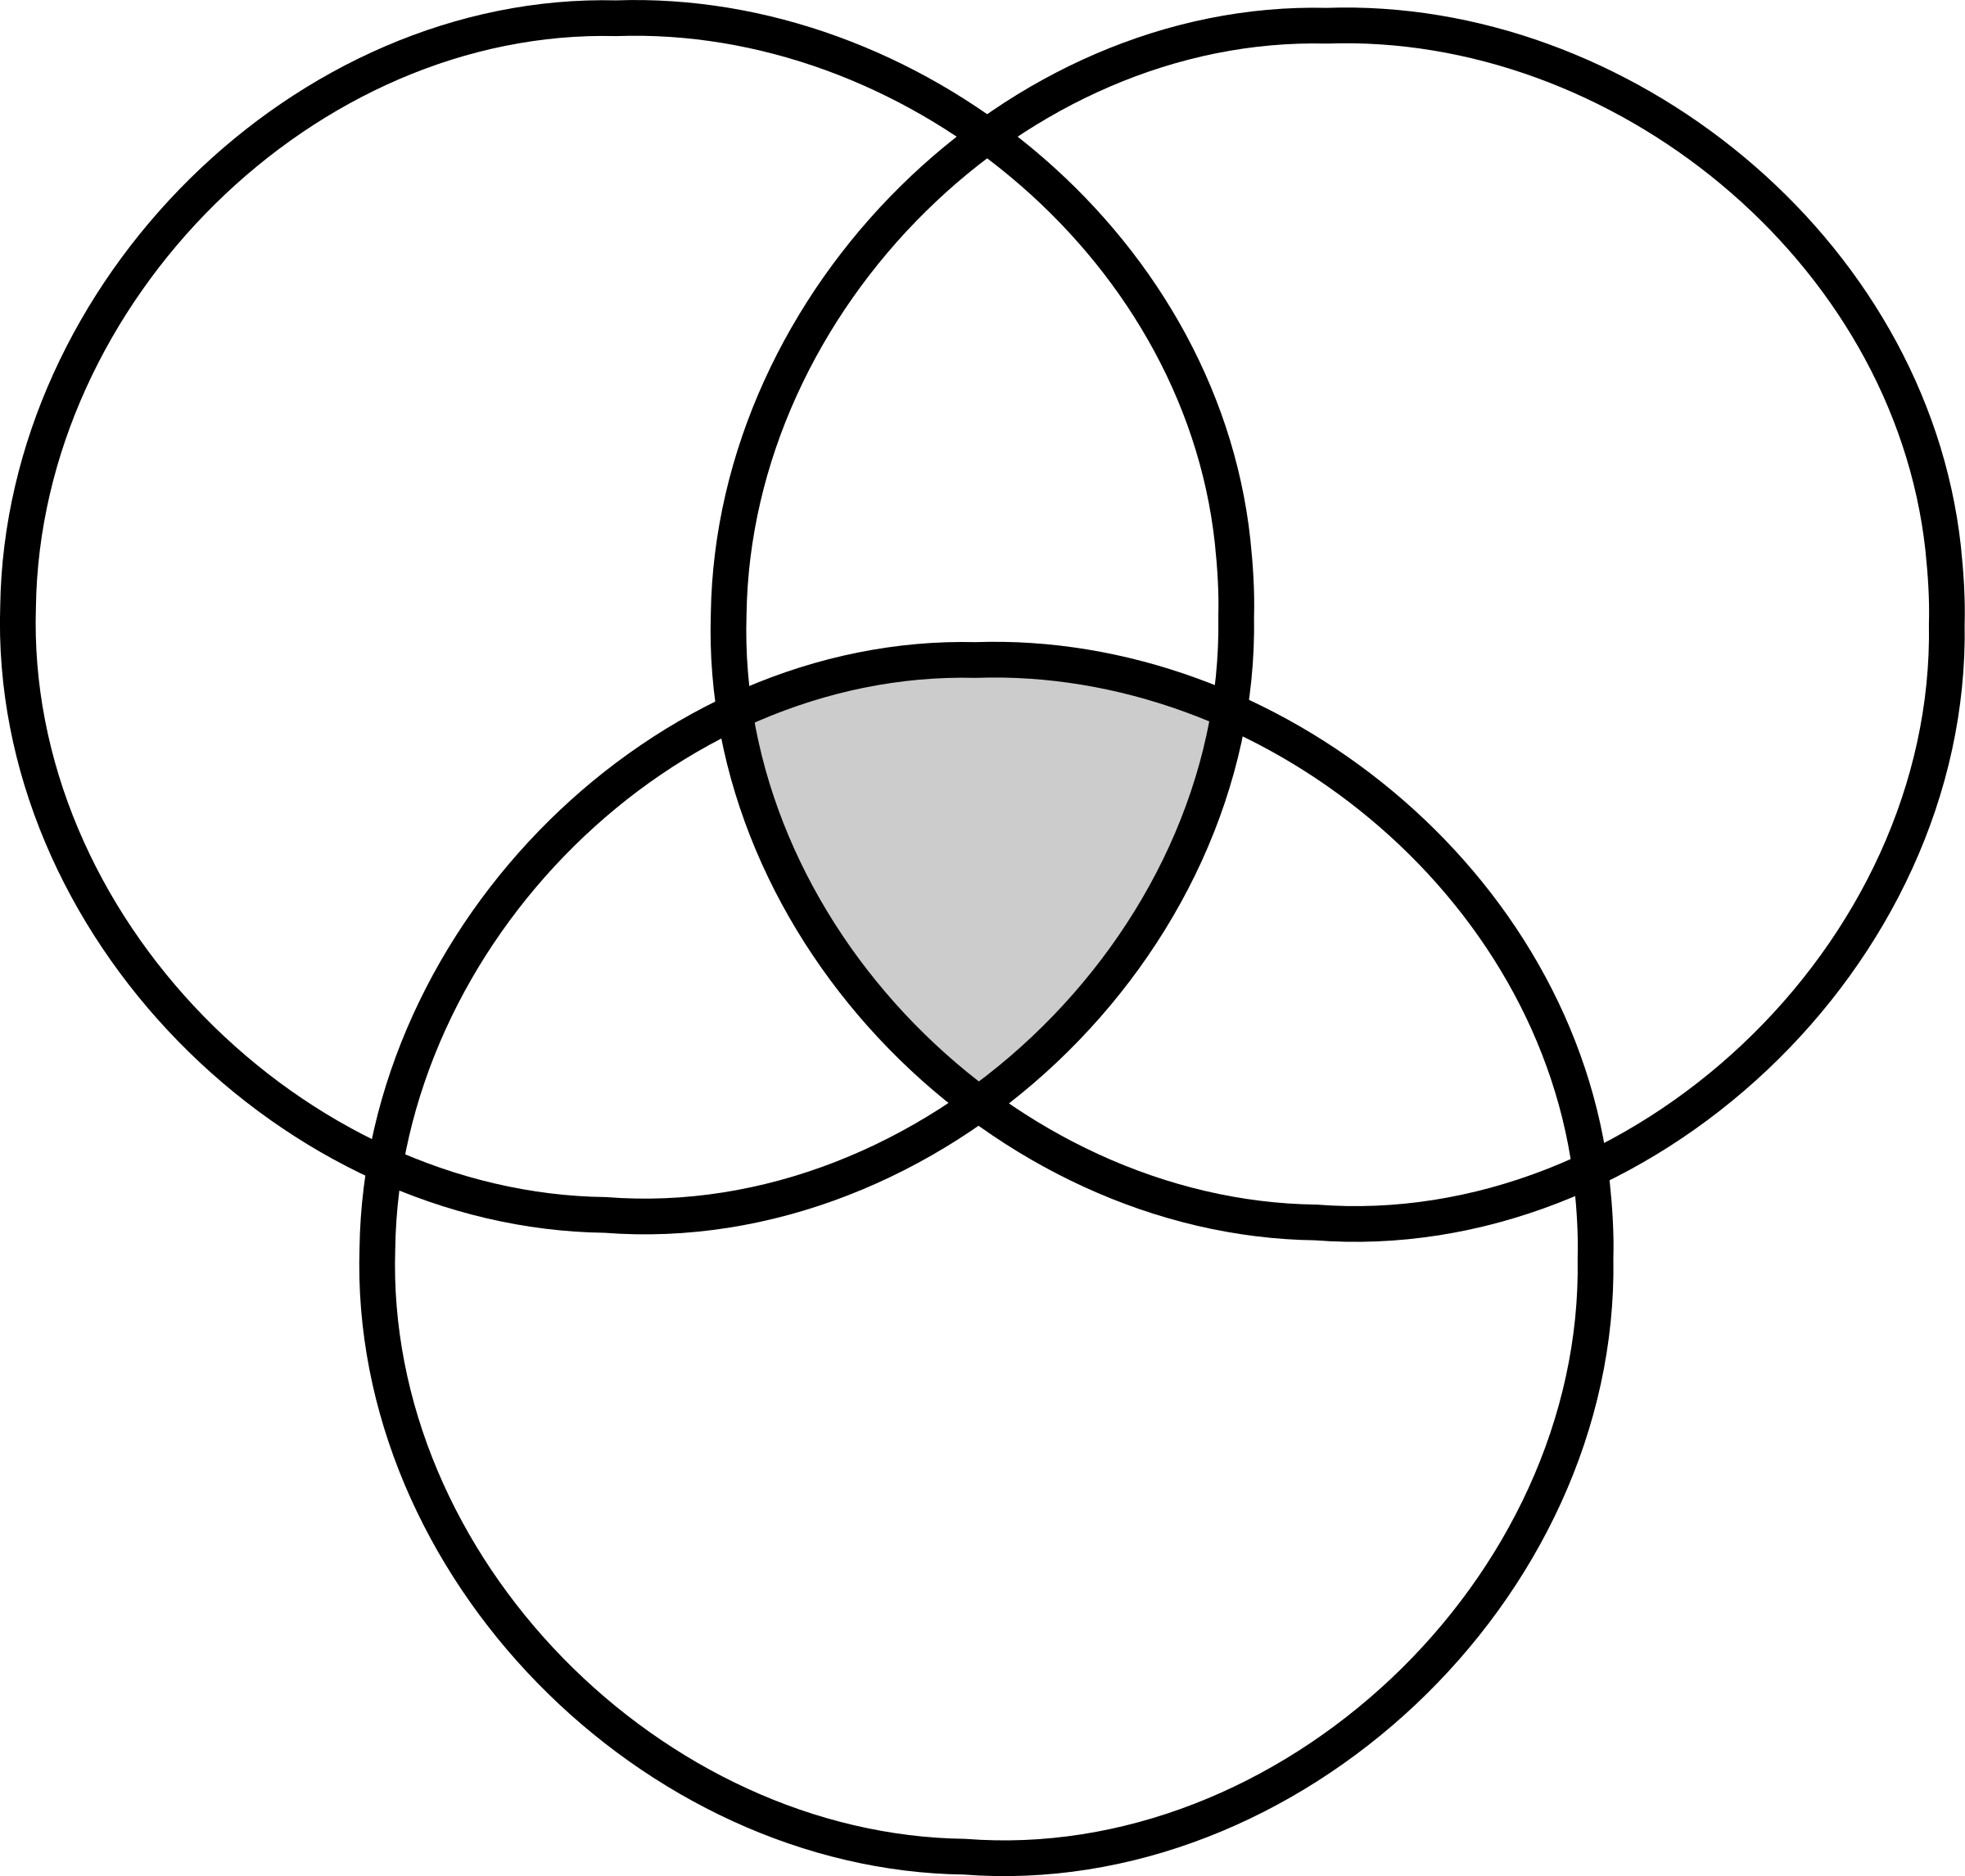 Clipart diagramme de venn venn diagram diagramme de venn venn diagram pooptronica Choice Image